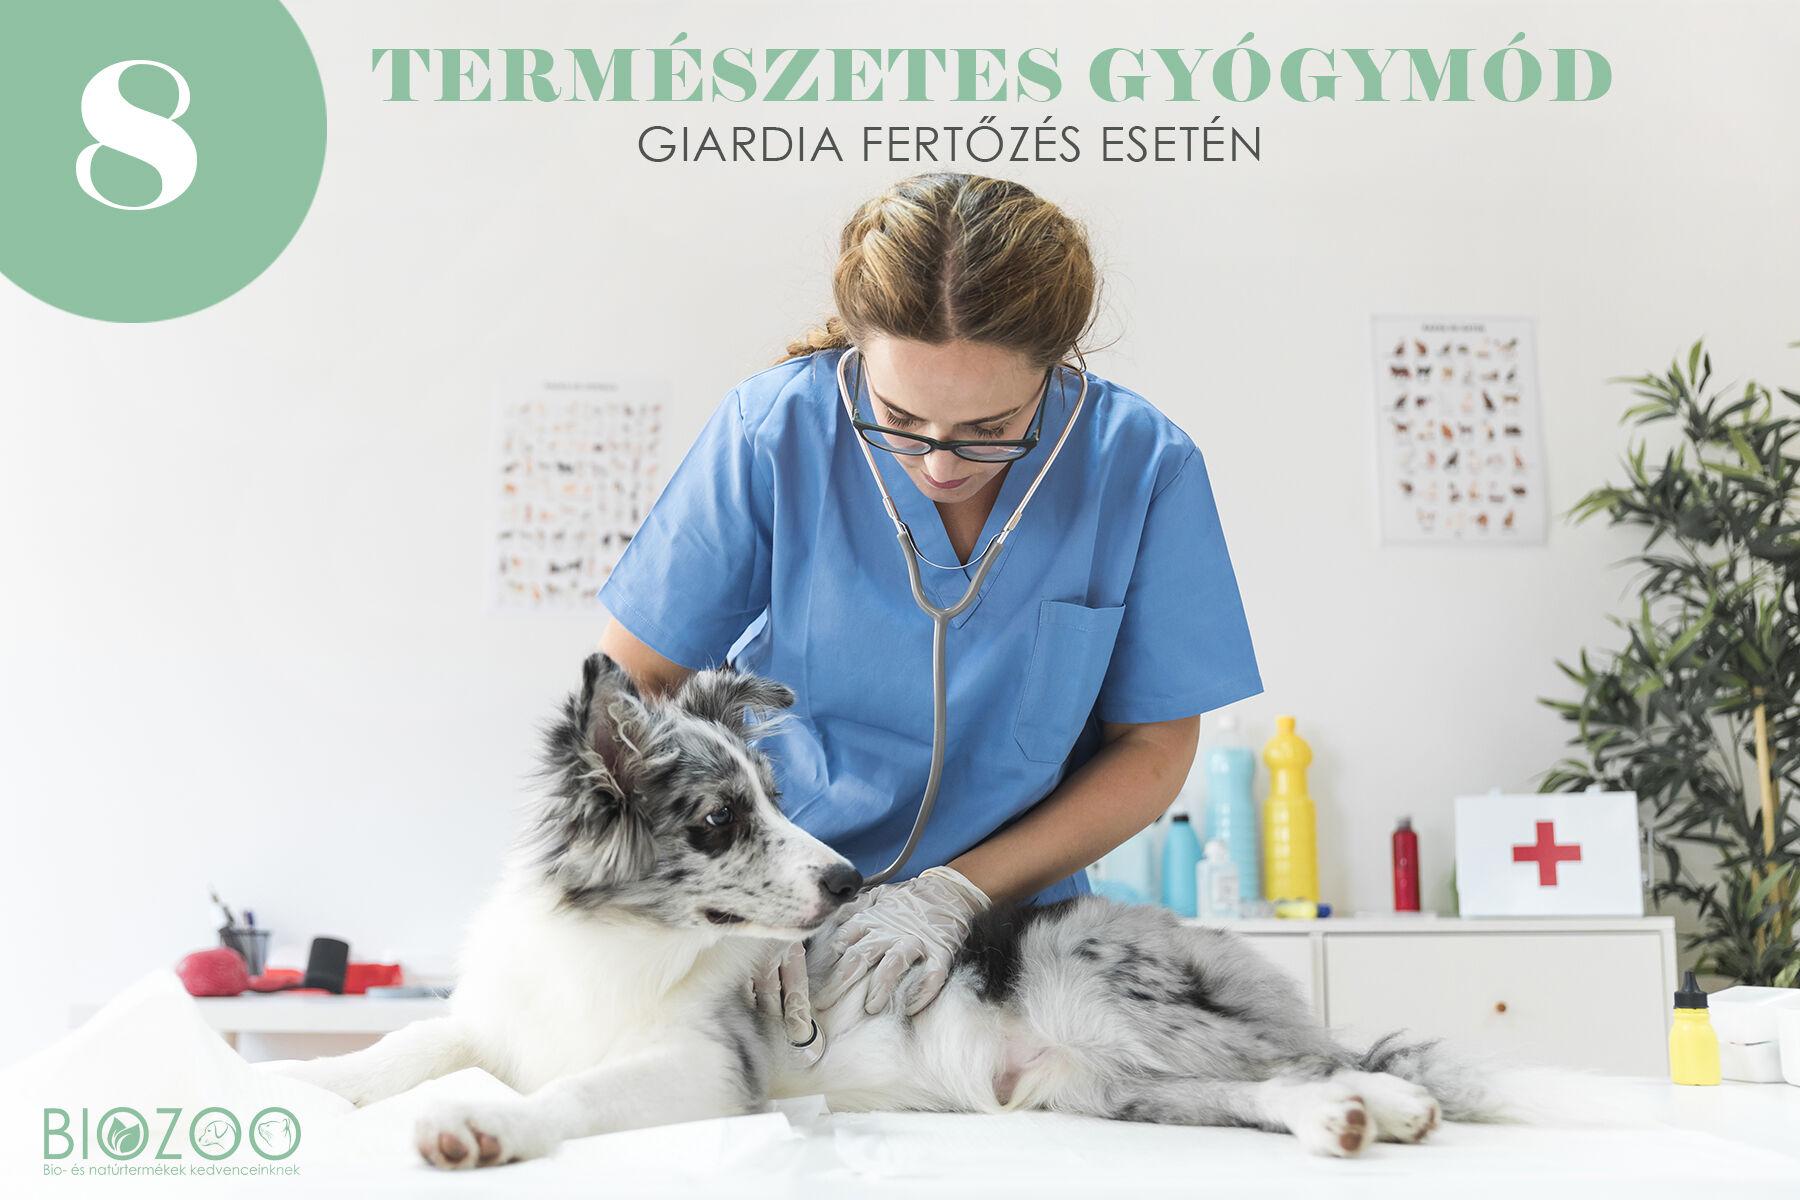 Informaciok: Giardia - Giardia tünetei kutya